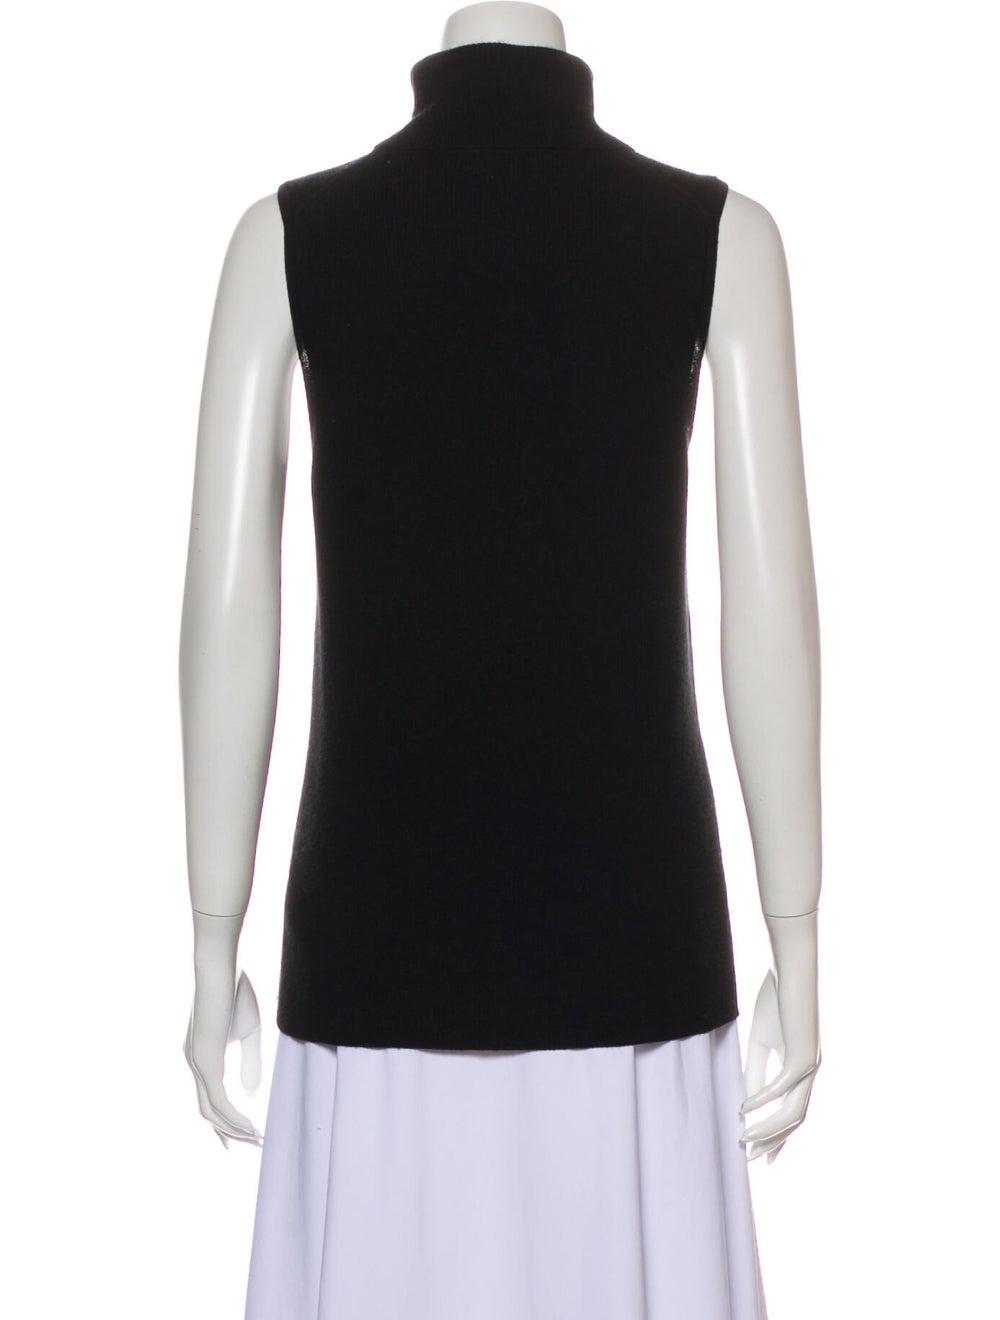 Equipment Silk Turtleneck Sweater Black - image 3